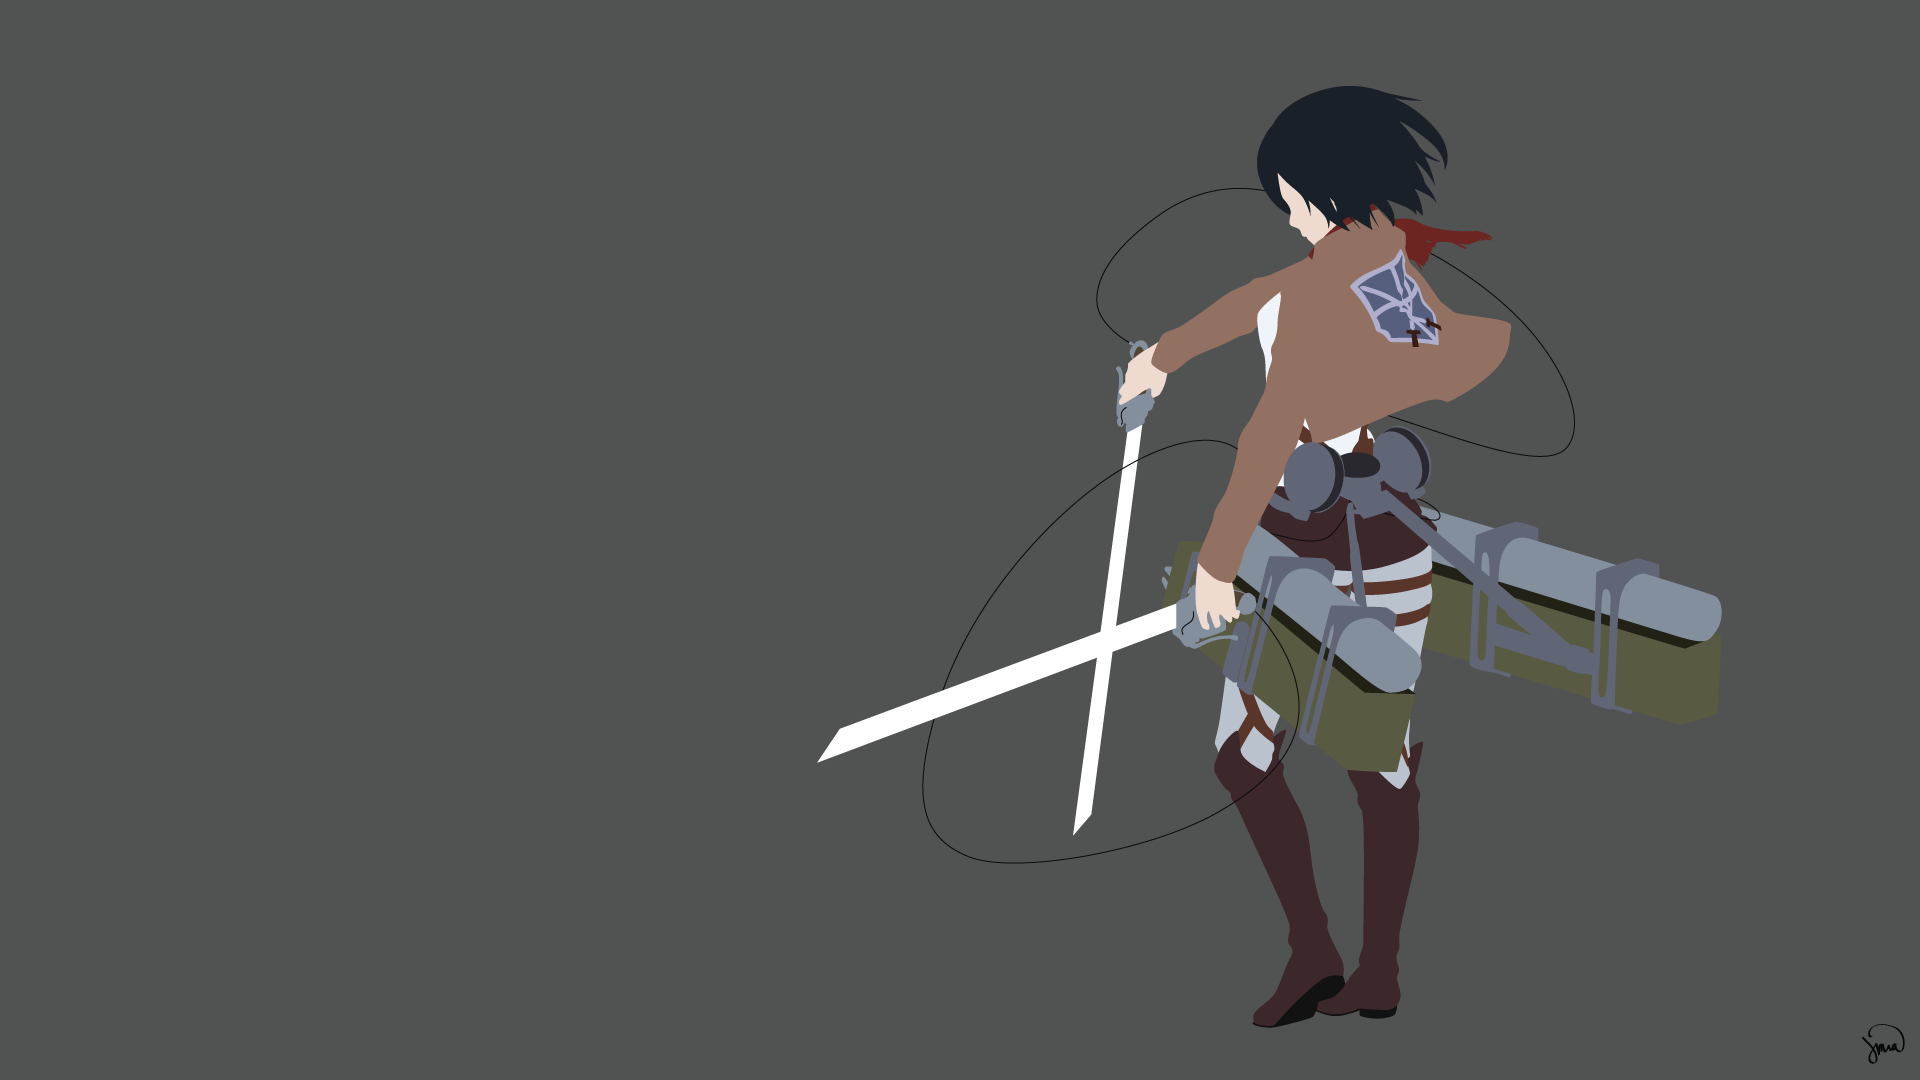 Anime Attack On Titan Mikasa Ackerman Wallpaper Mikasa Attack